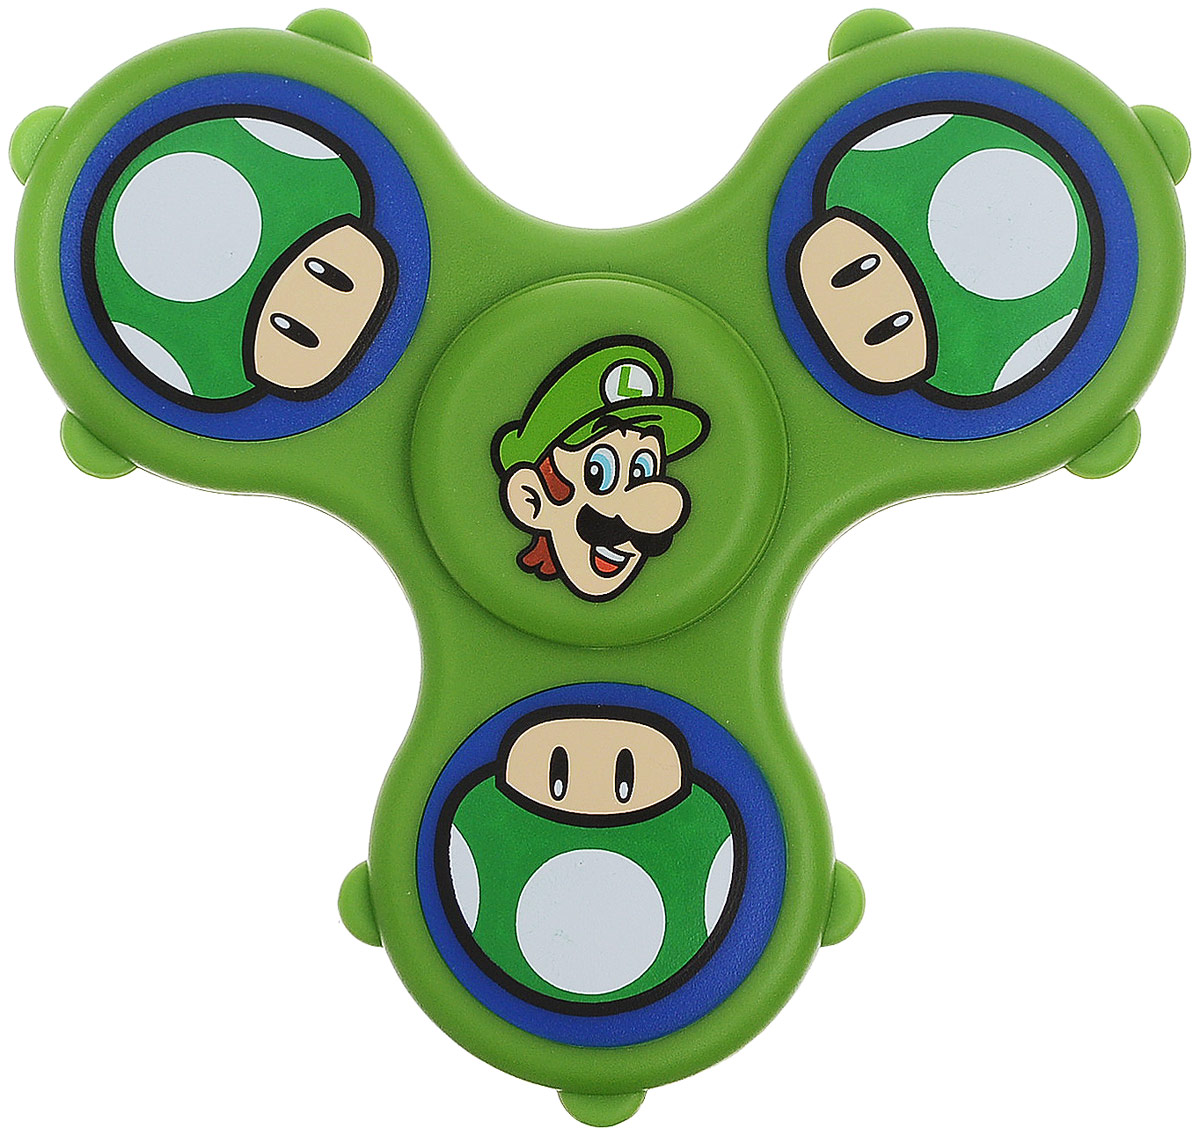 Fidget Its Спиннер Nintendo Luigi игрушка антистресс fidget cube blue